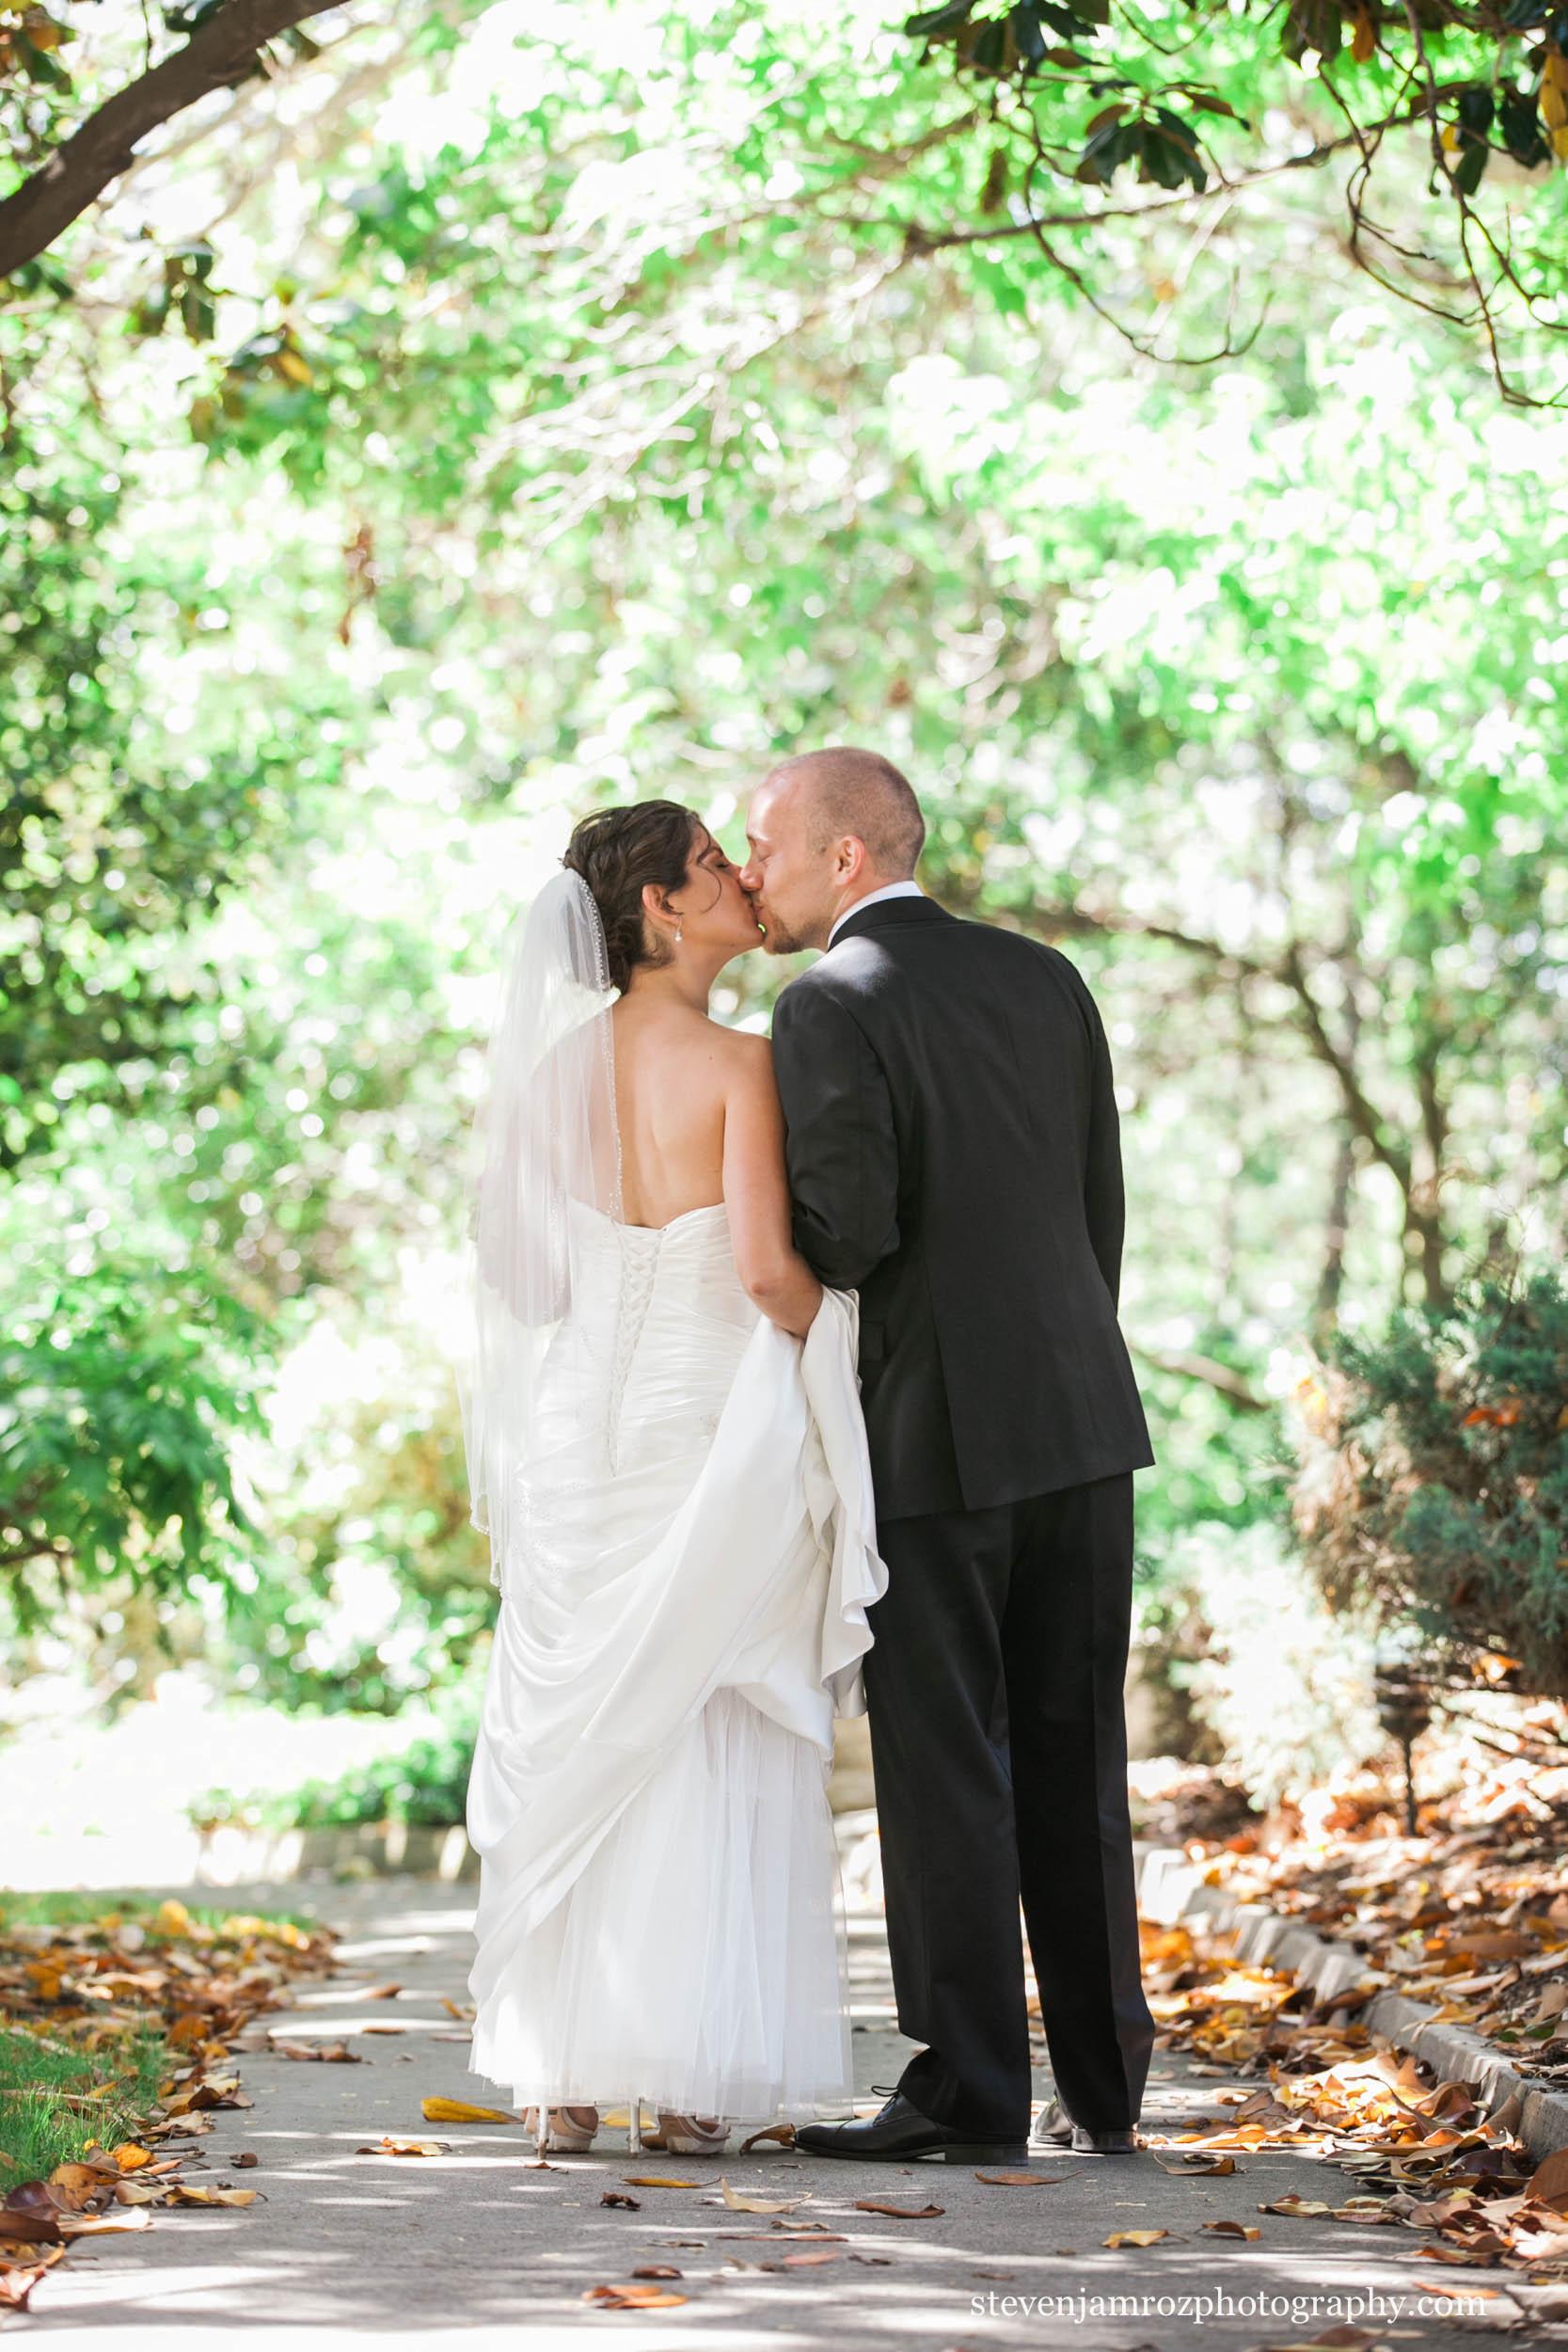 natural-portrait-wedding-couple-steven-jamroz-0685.jpg